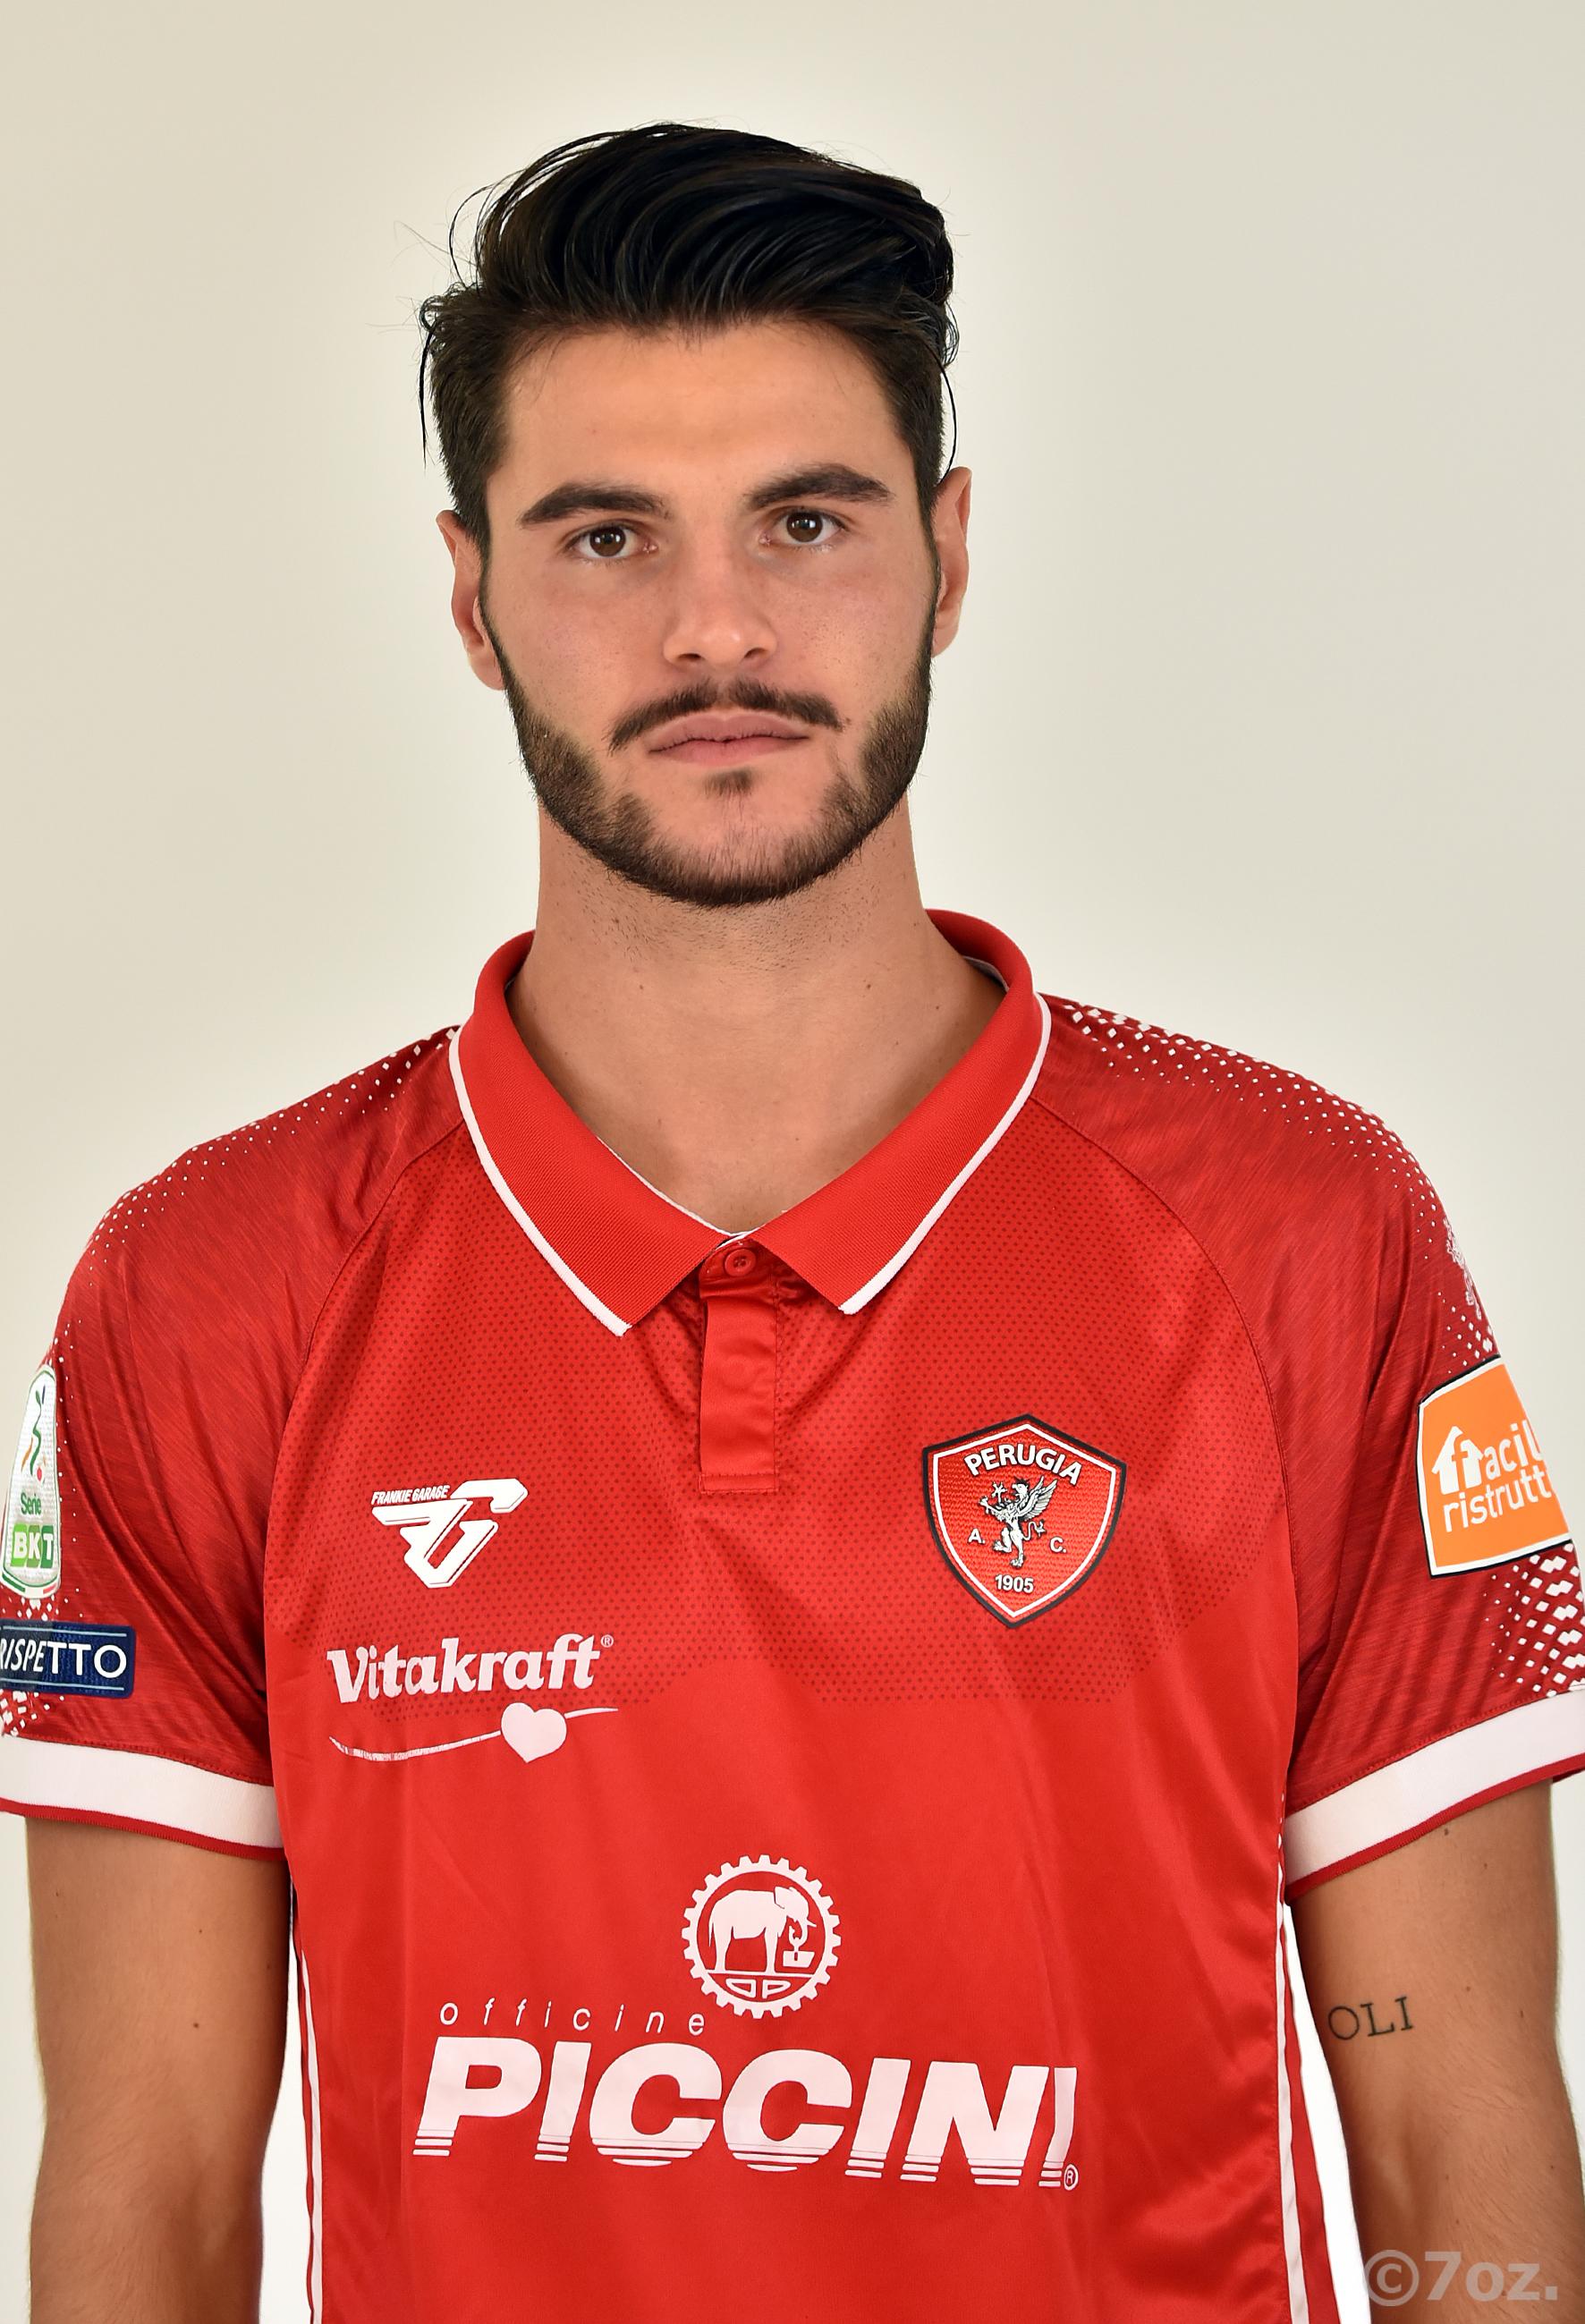 Marco CarraroCentrocampista- A.C. Perugia Calcio